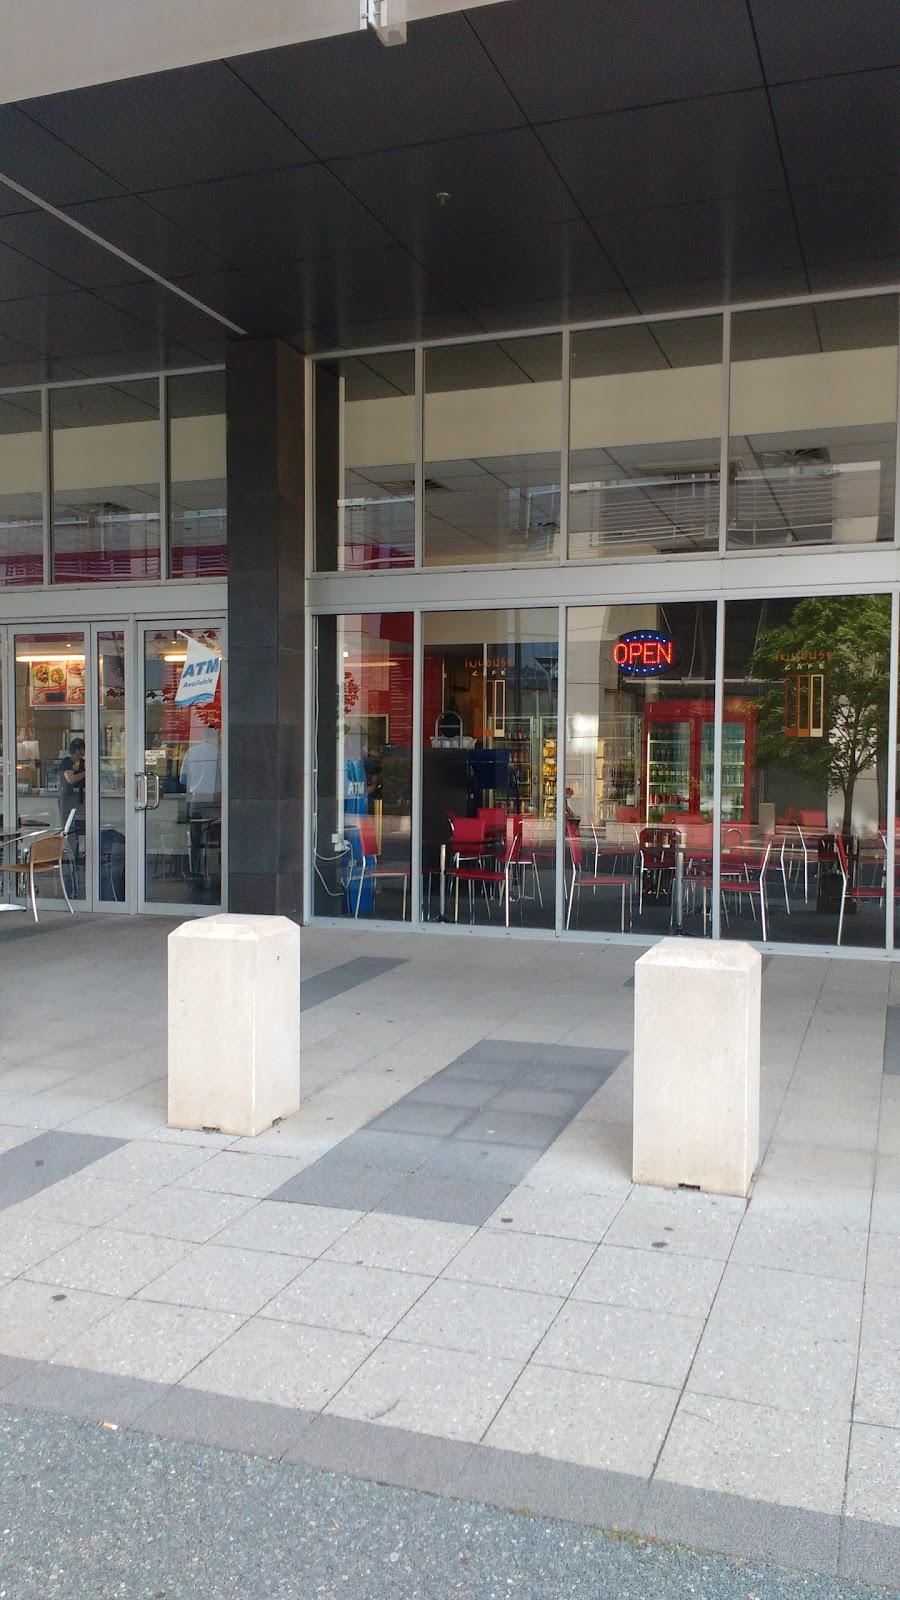 Happy Hub Cafe | cafe | 16 Furzer St, Phillip ACT 2606, Australia | 0262816744 OR +61 2 6281 6744